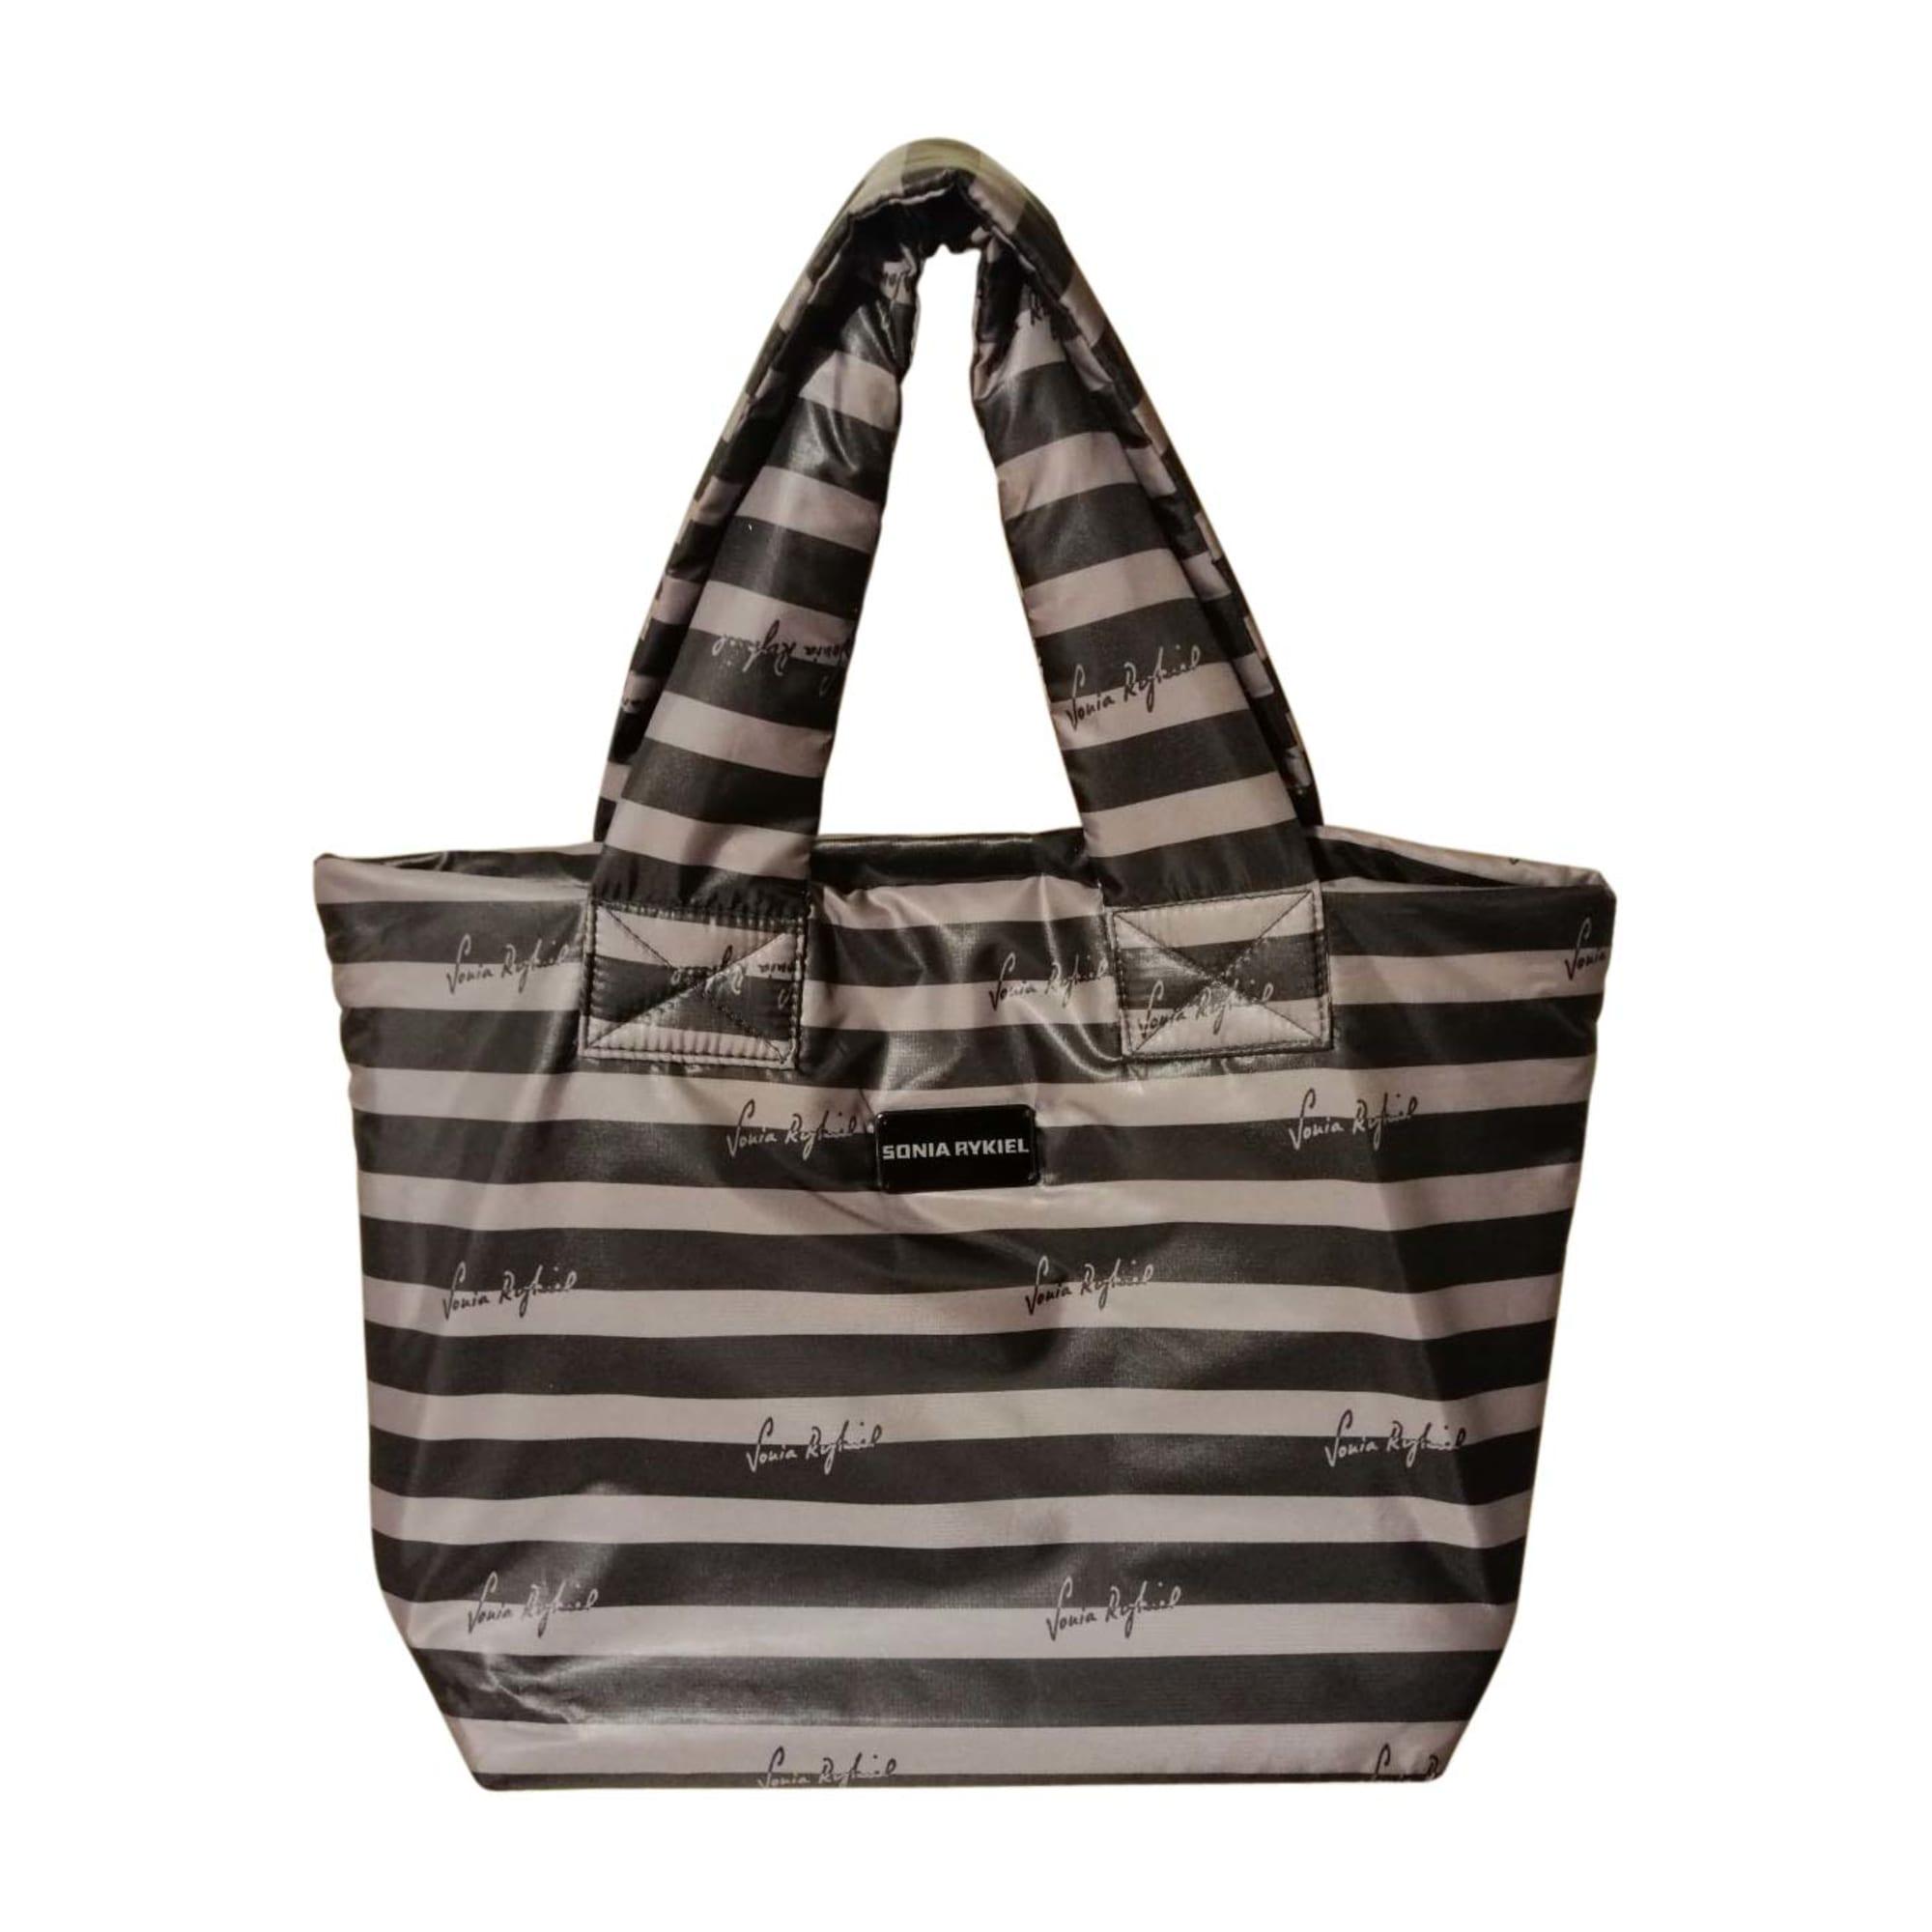 Non-Leather Handbag SONIA RYKIEL rayures taupe/noir